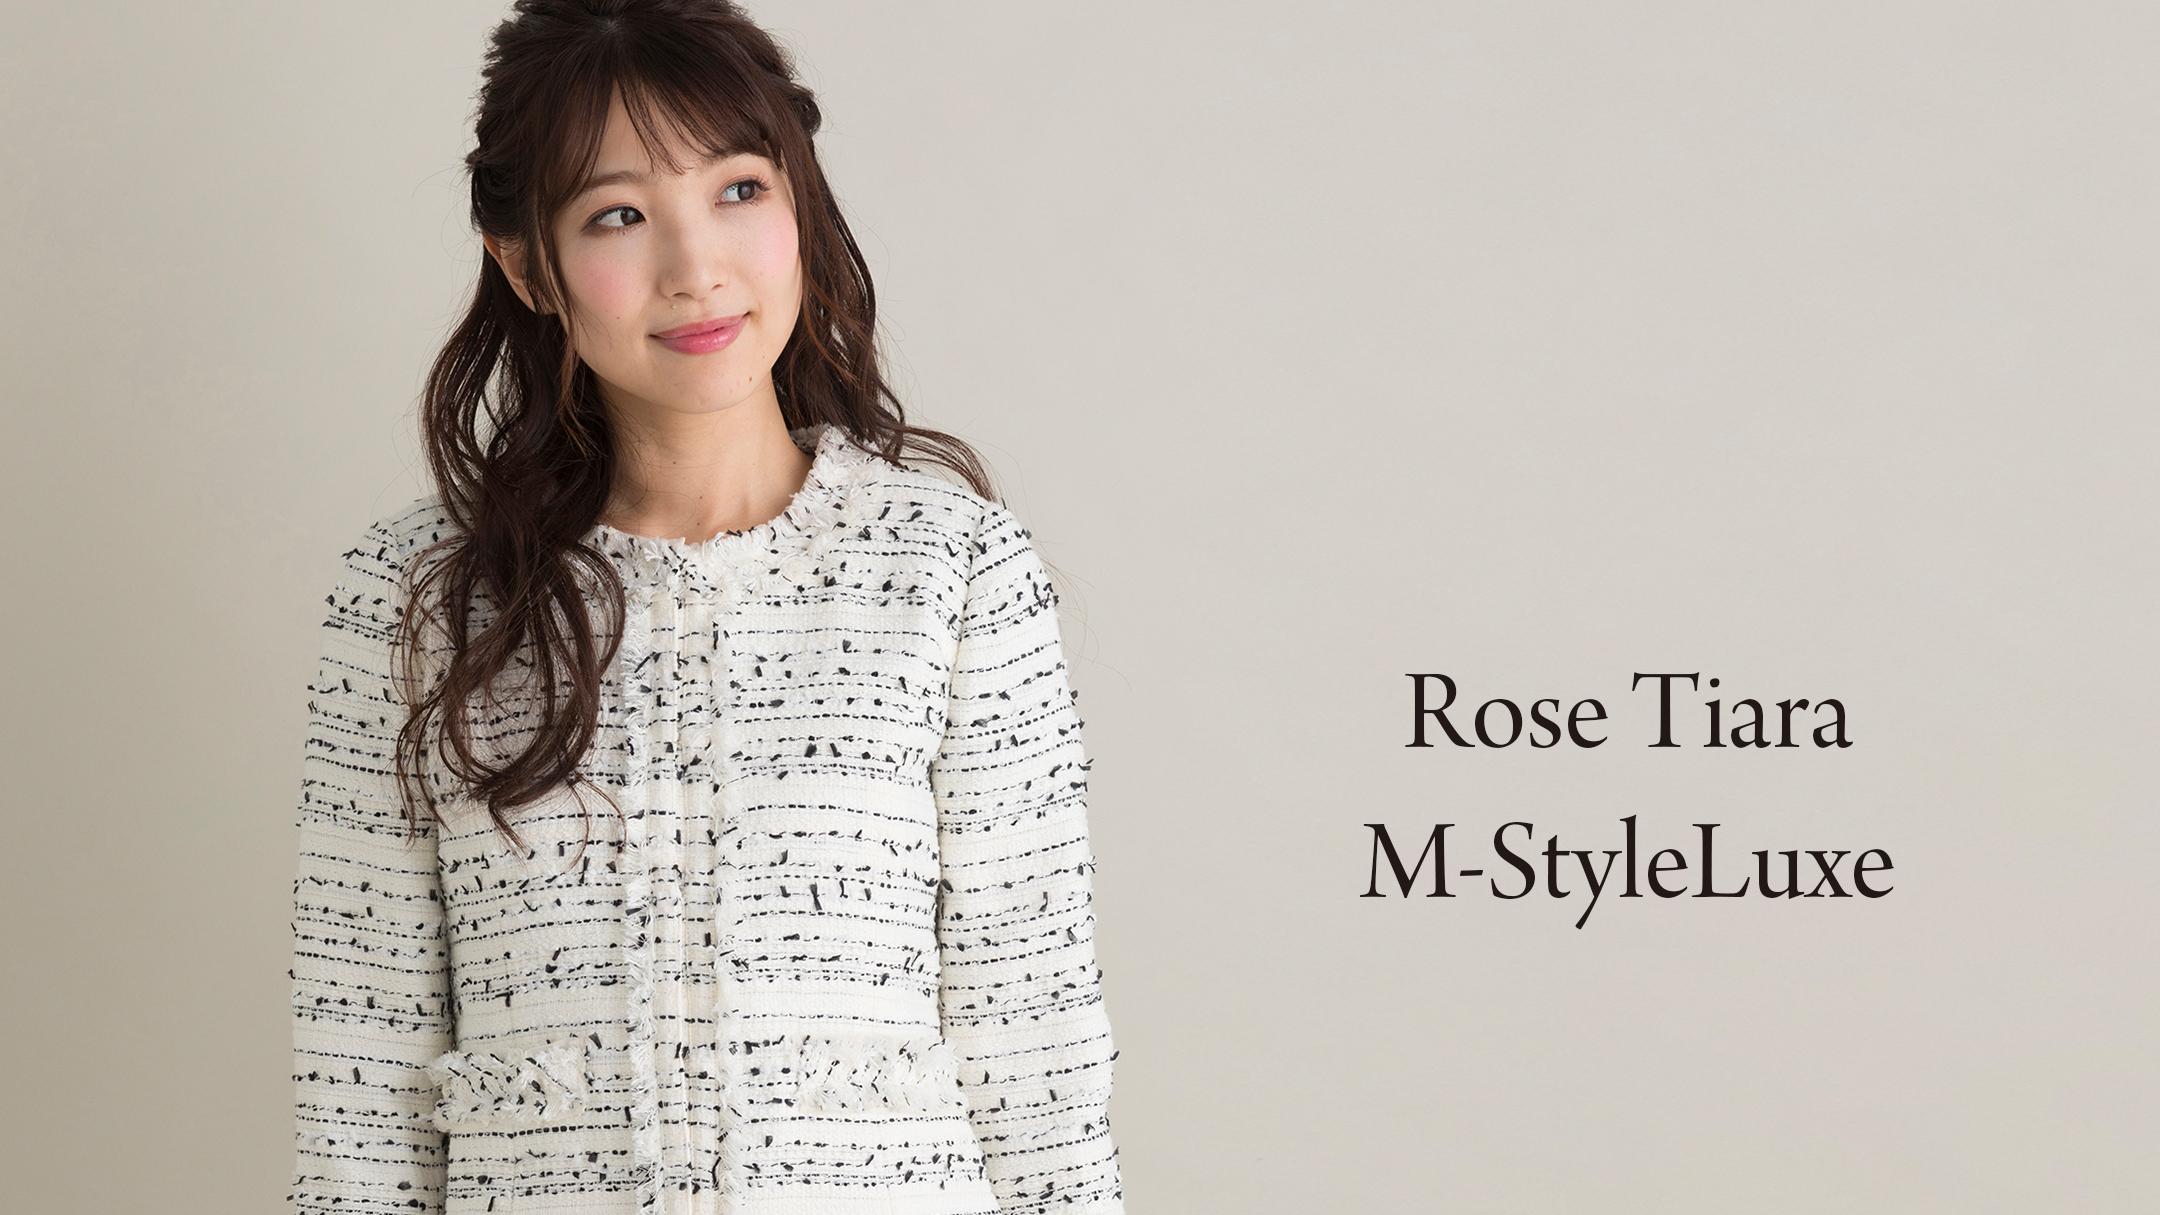 M-StyleLuxeコラボアイテム、ツイードジャケット